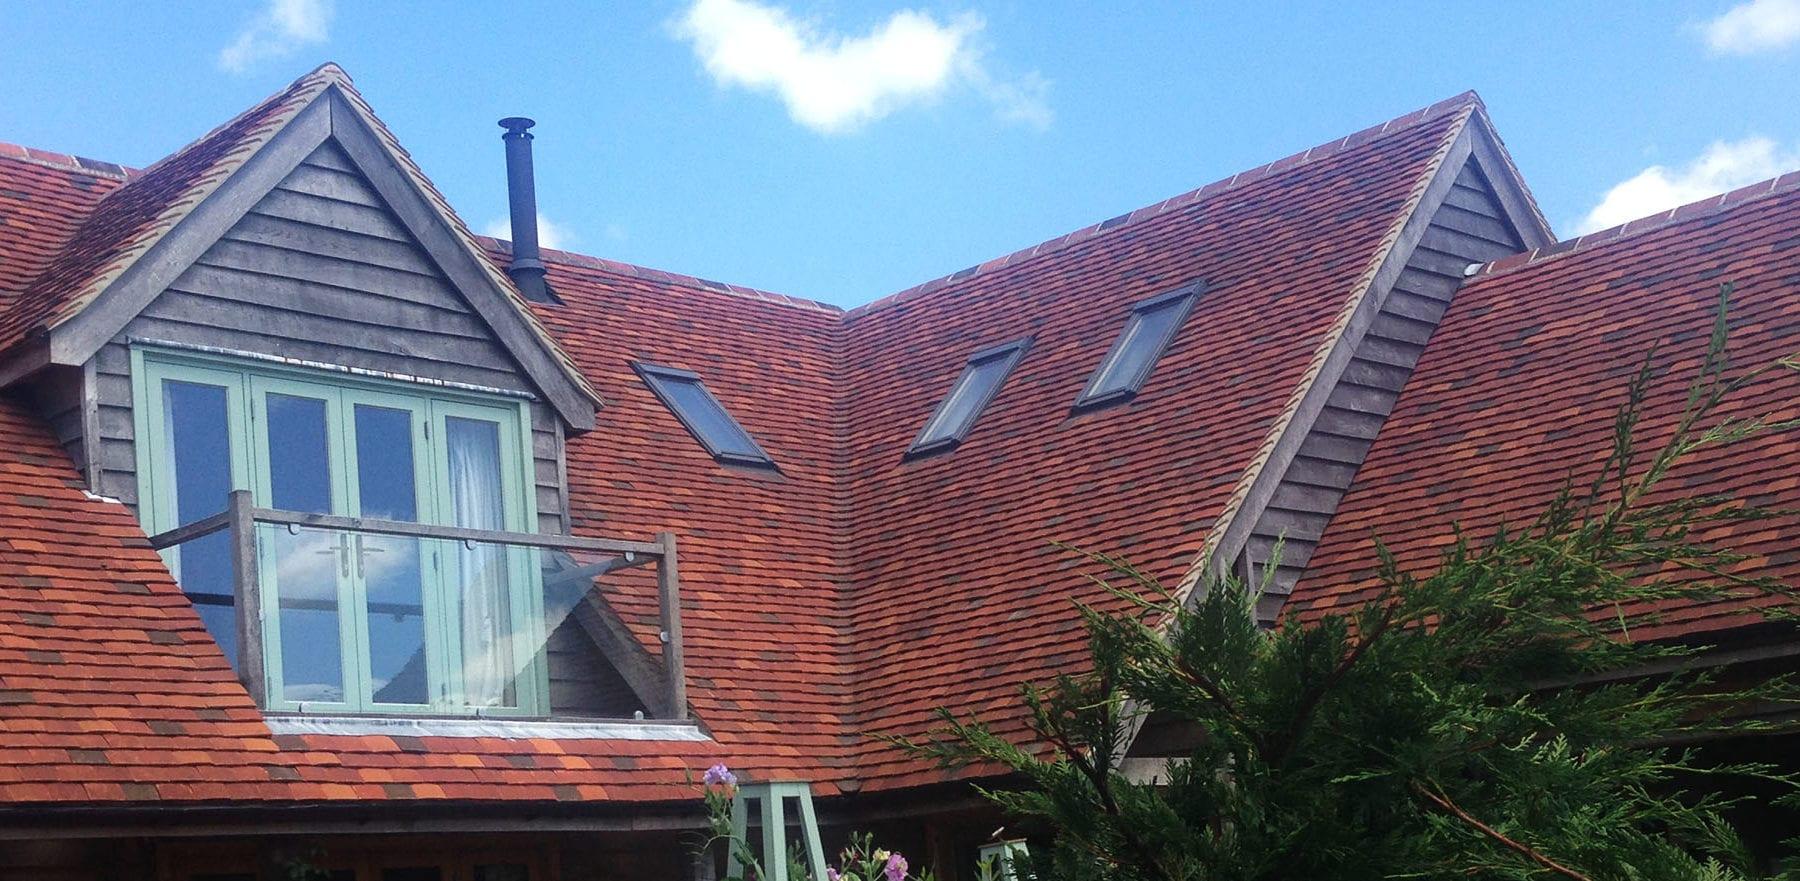 Lifestiles - Handmade Multi Clay Roof Tiles - Stephen Evans Architect, England 3